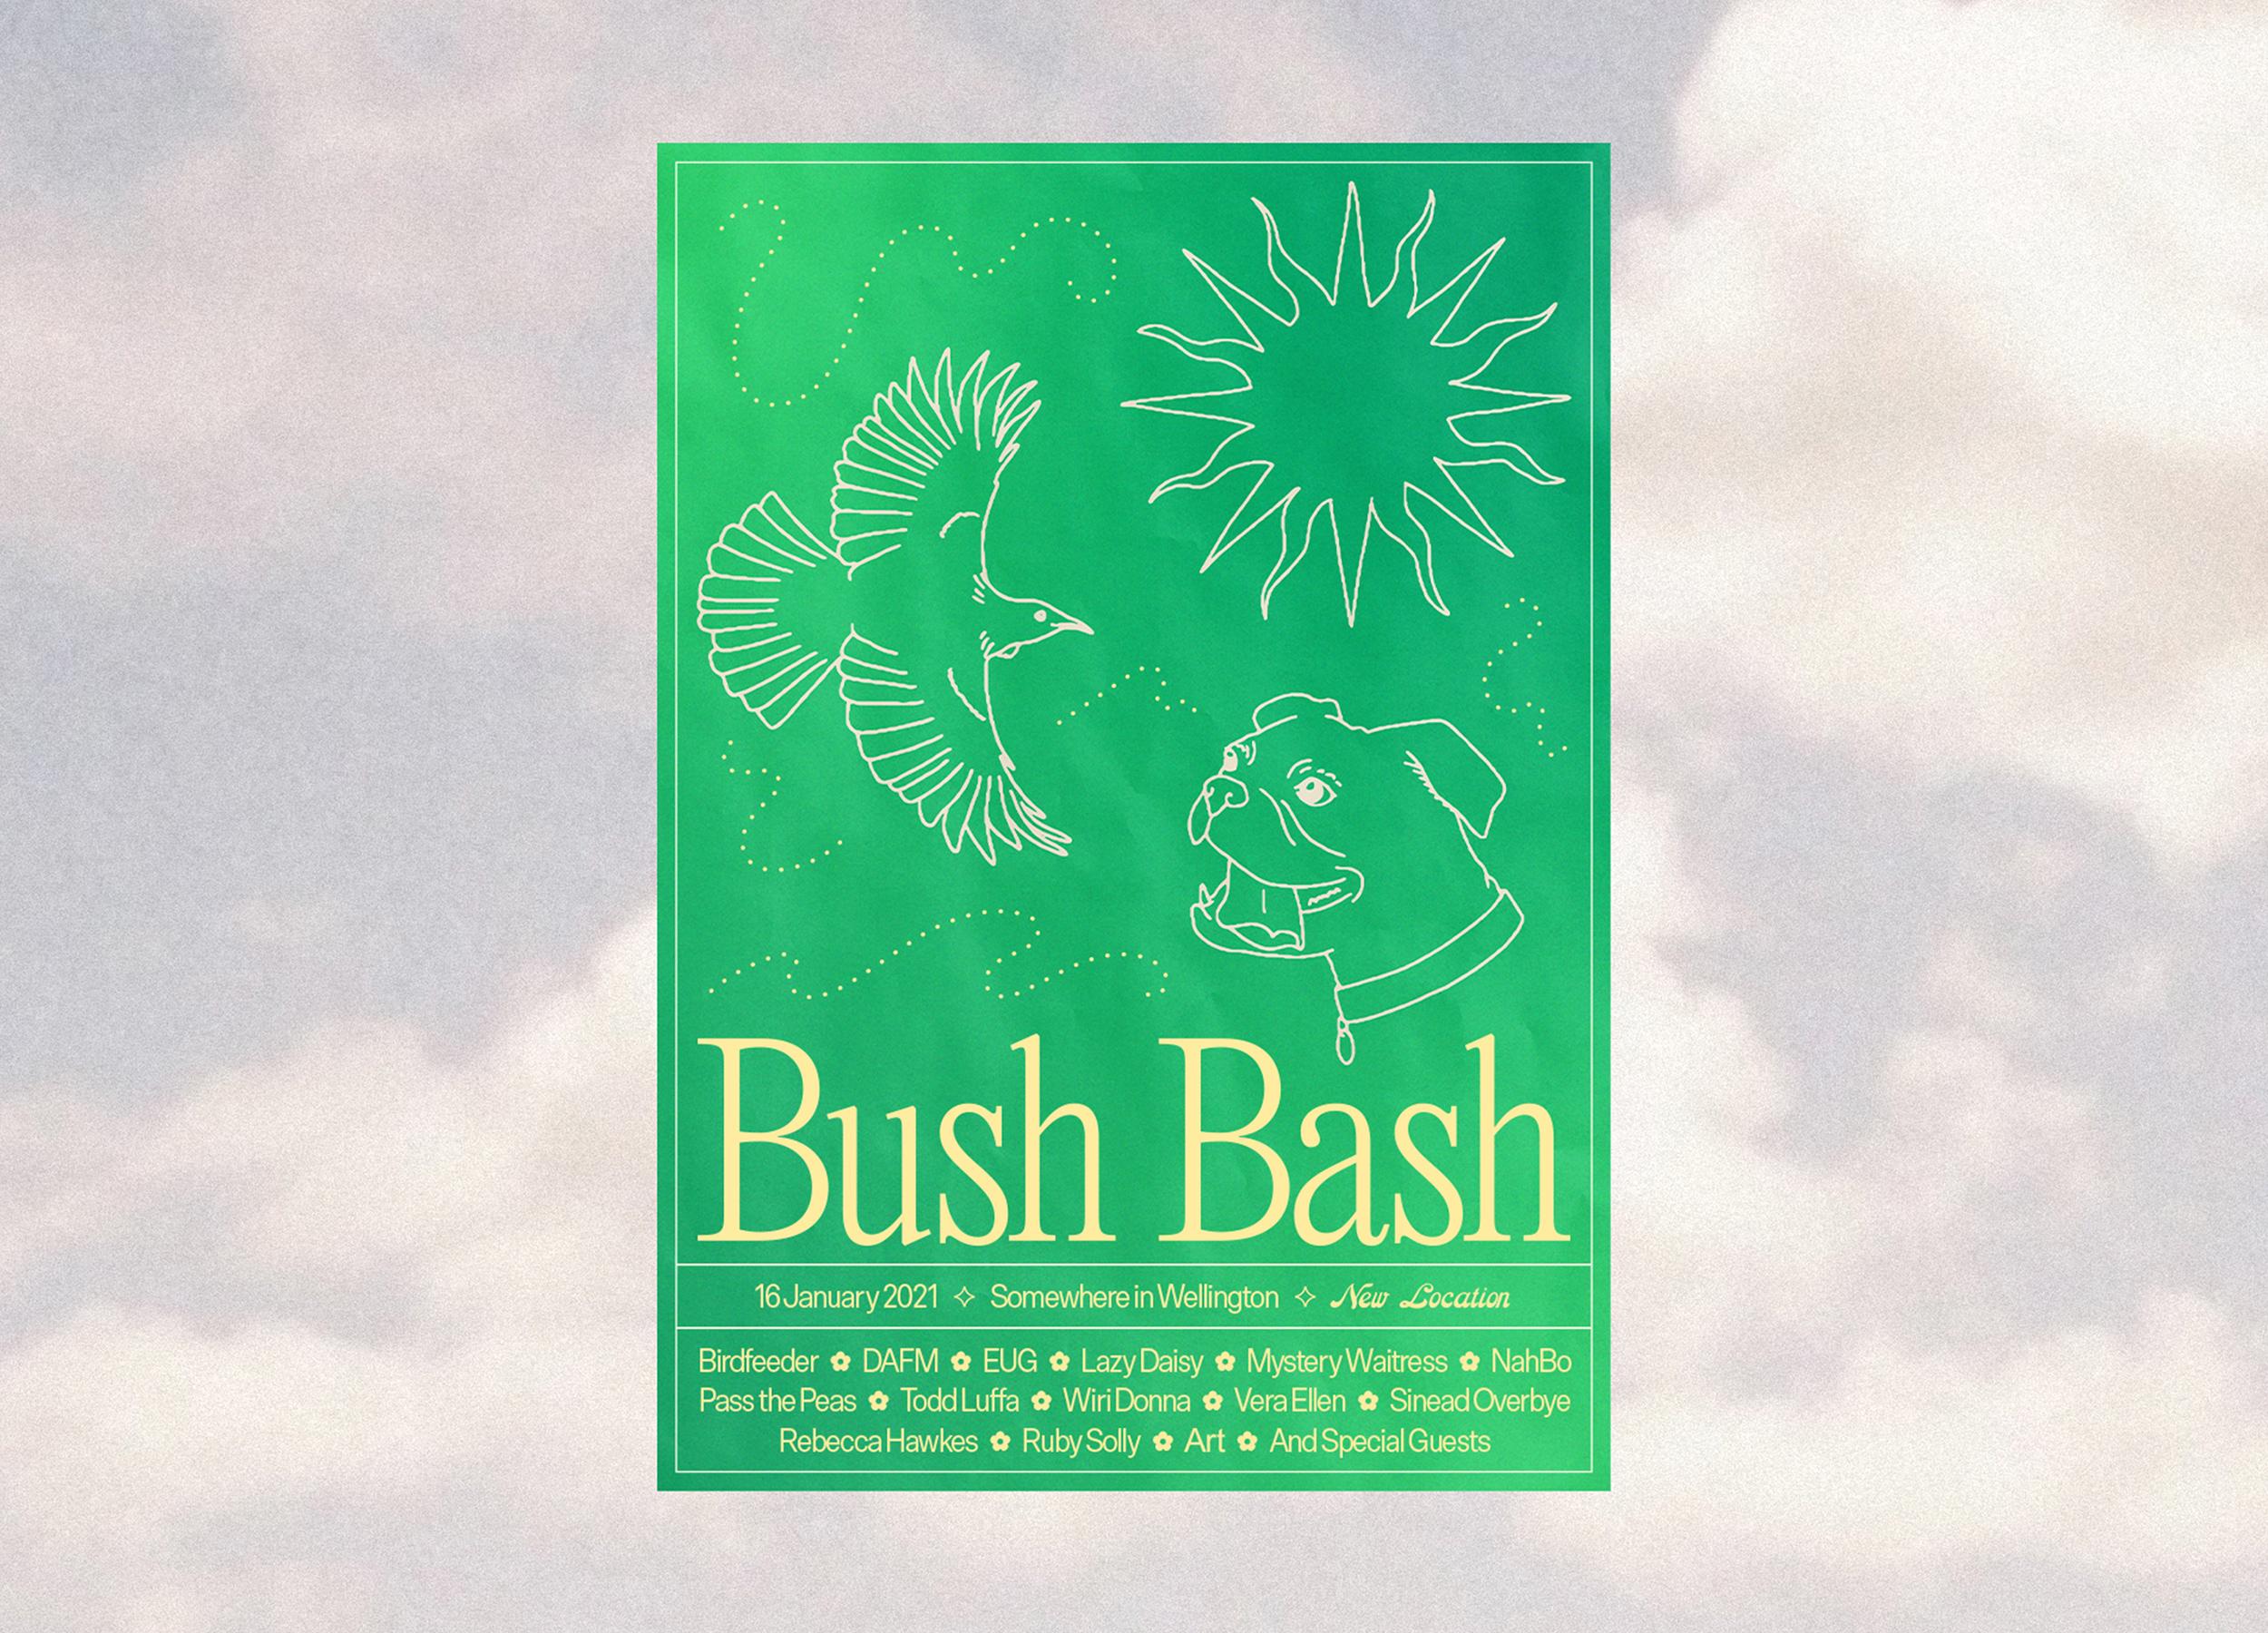 Bush Bash 2021 Poster